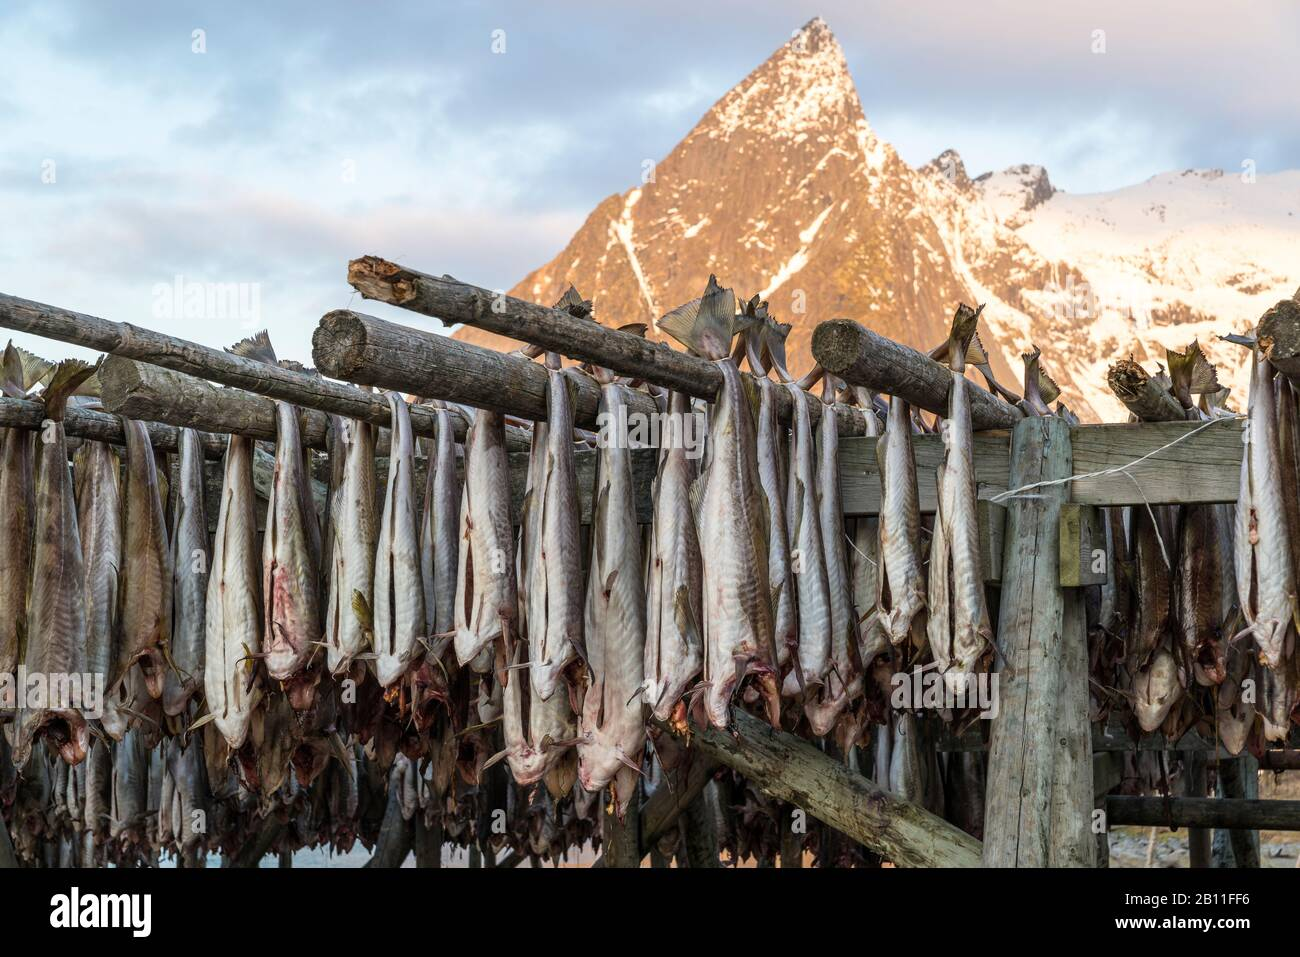 Cod hangs to dry on wooden racks in front of the mountain Olstinden, Moskenes, Lofoten, Norway Stock Photo